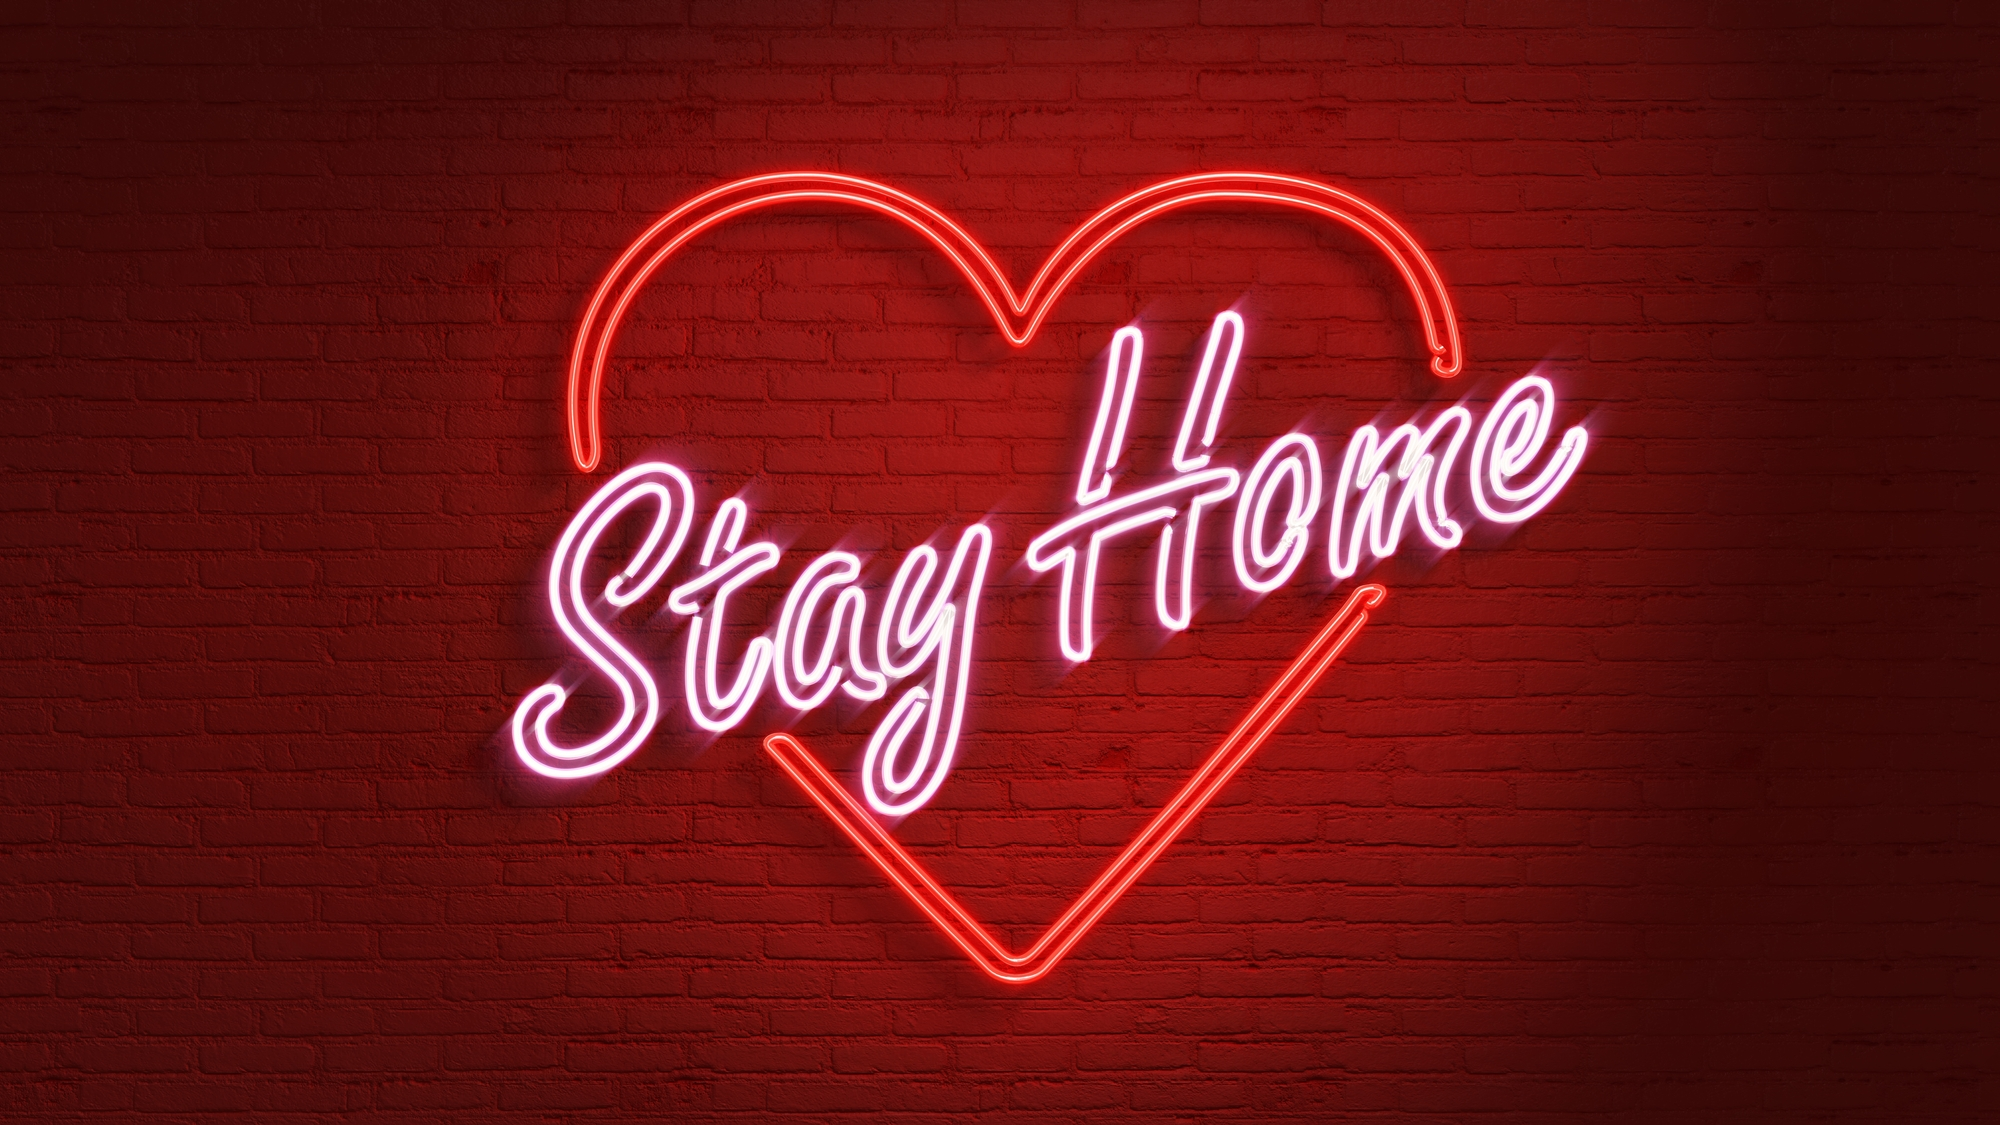 Corona - Stay at home leuchtreklame mit Herz